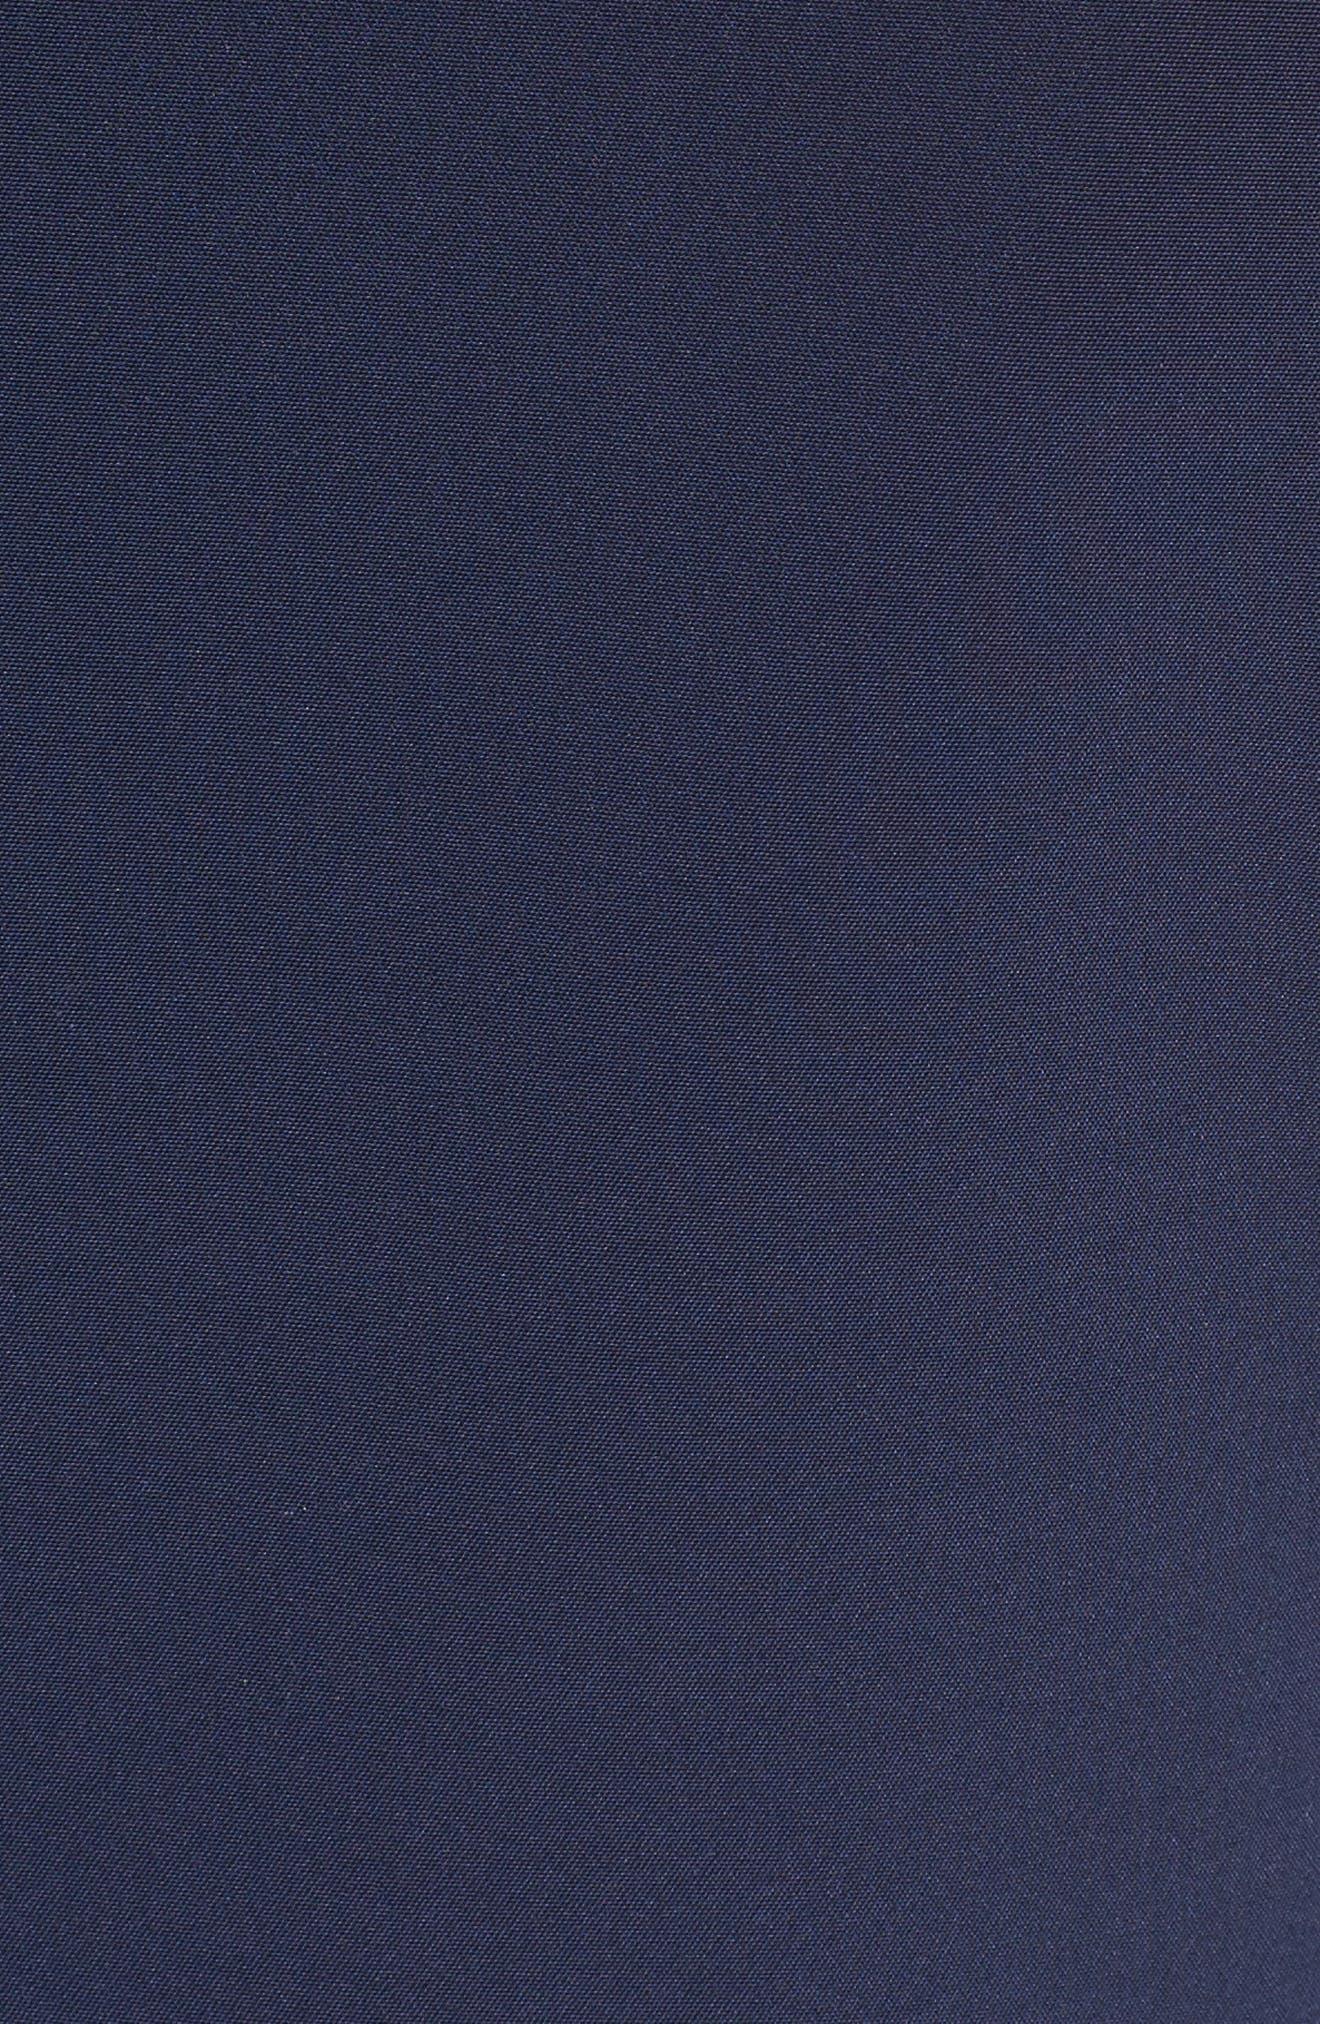 Alternate Image 3  - Lafayette 148 New York Tamera Perforated Fit & Flare Dress